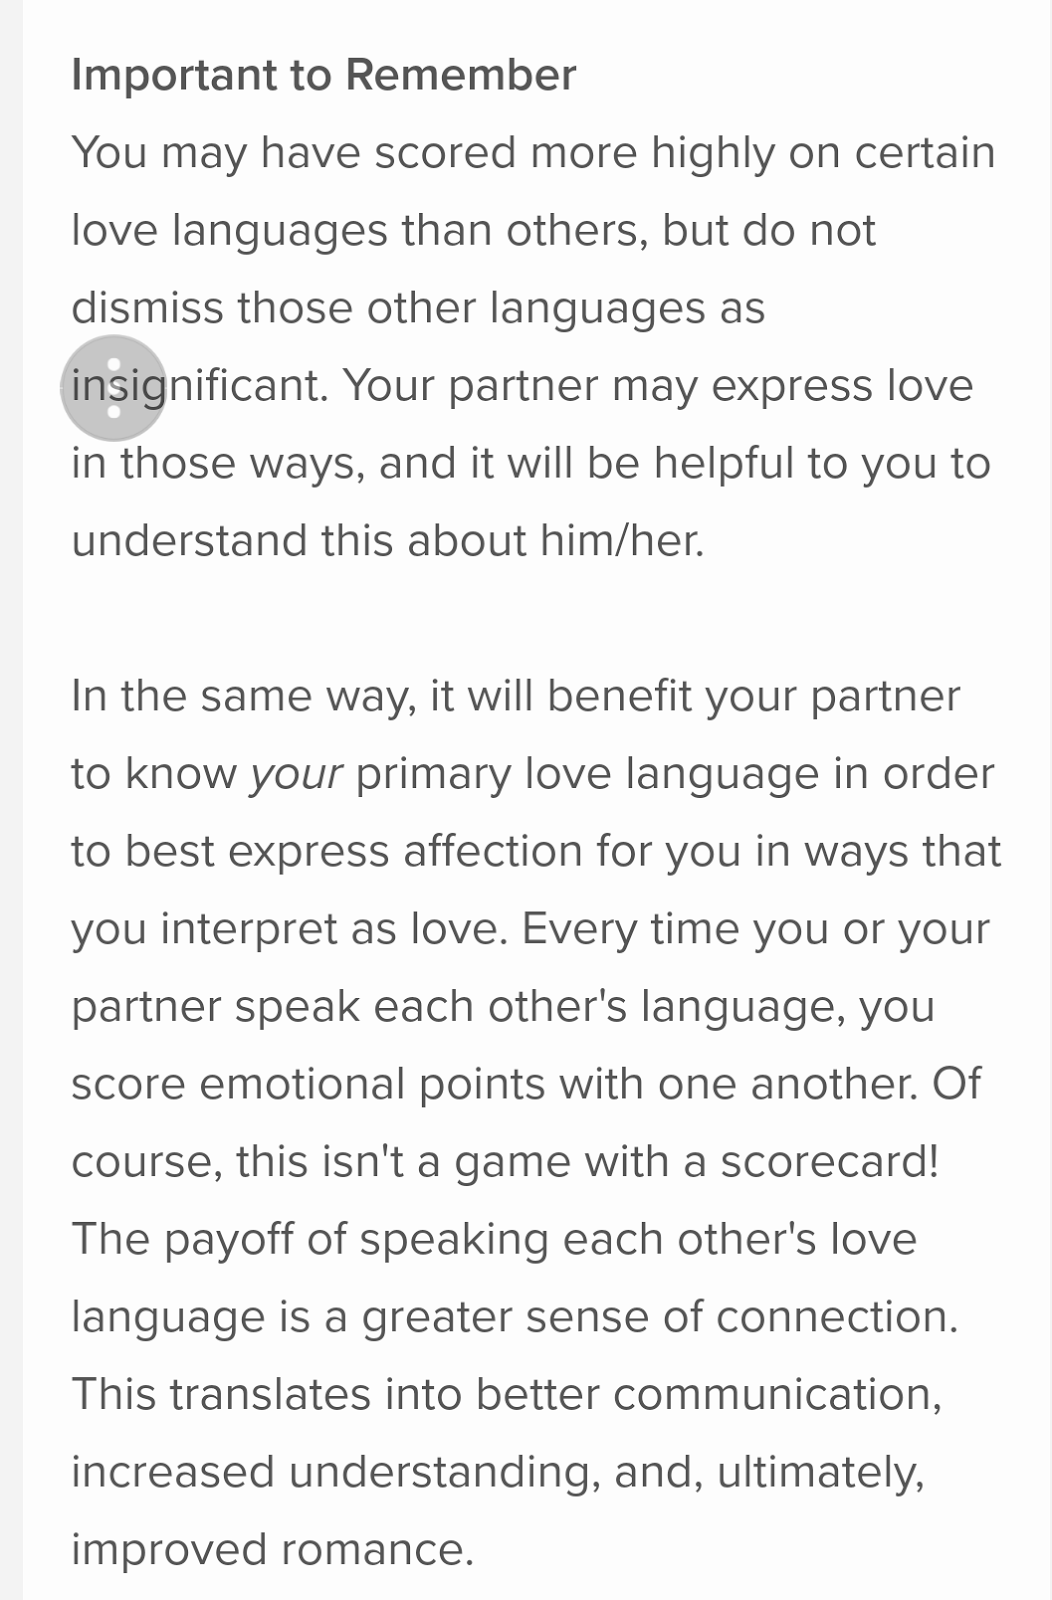 5 love languages quiz for husbands